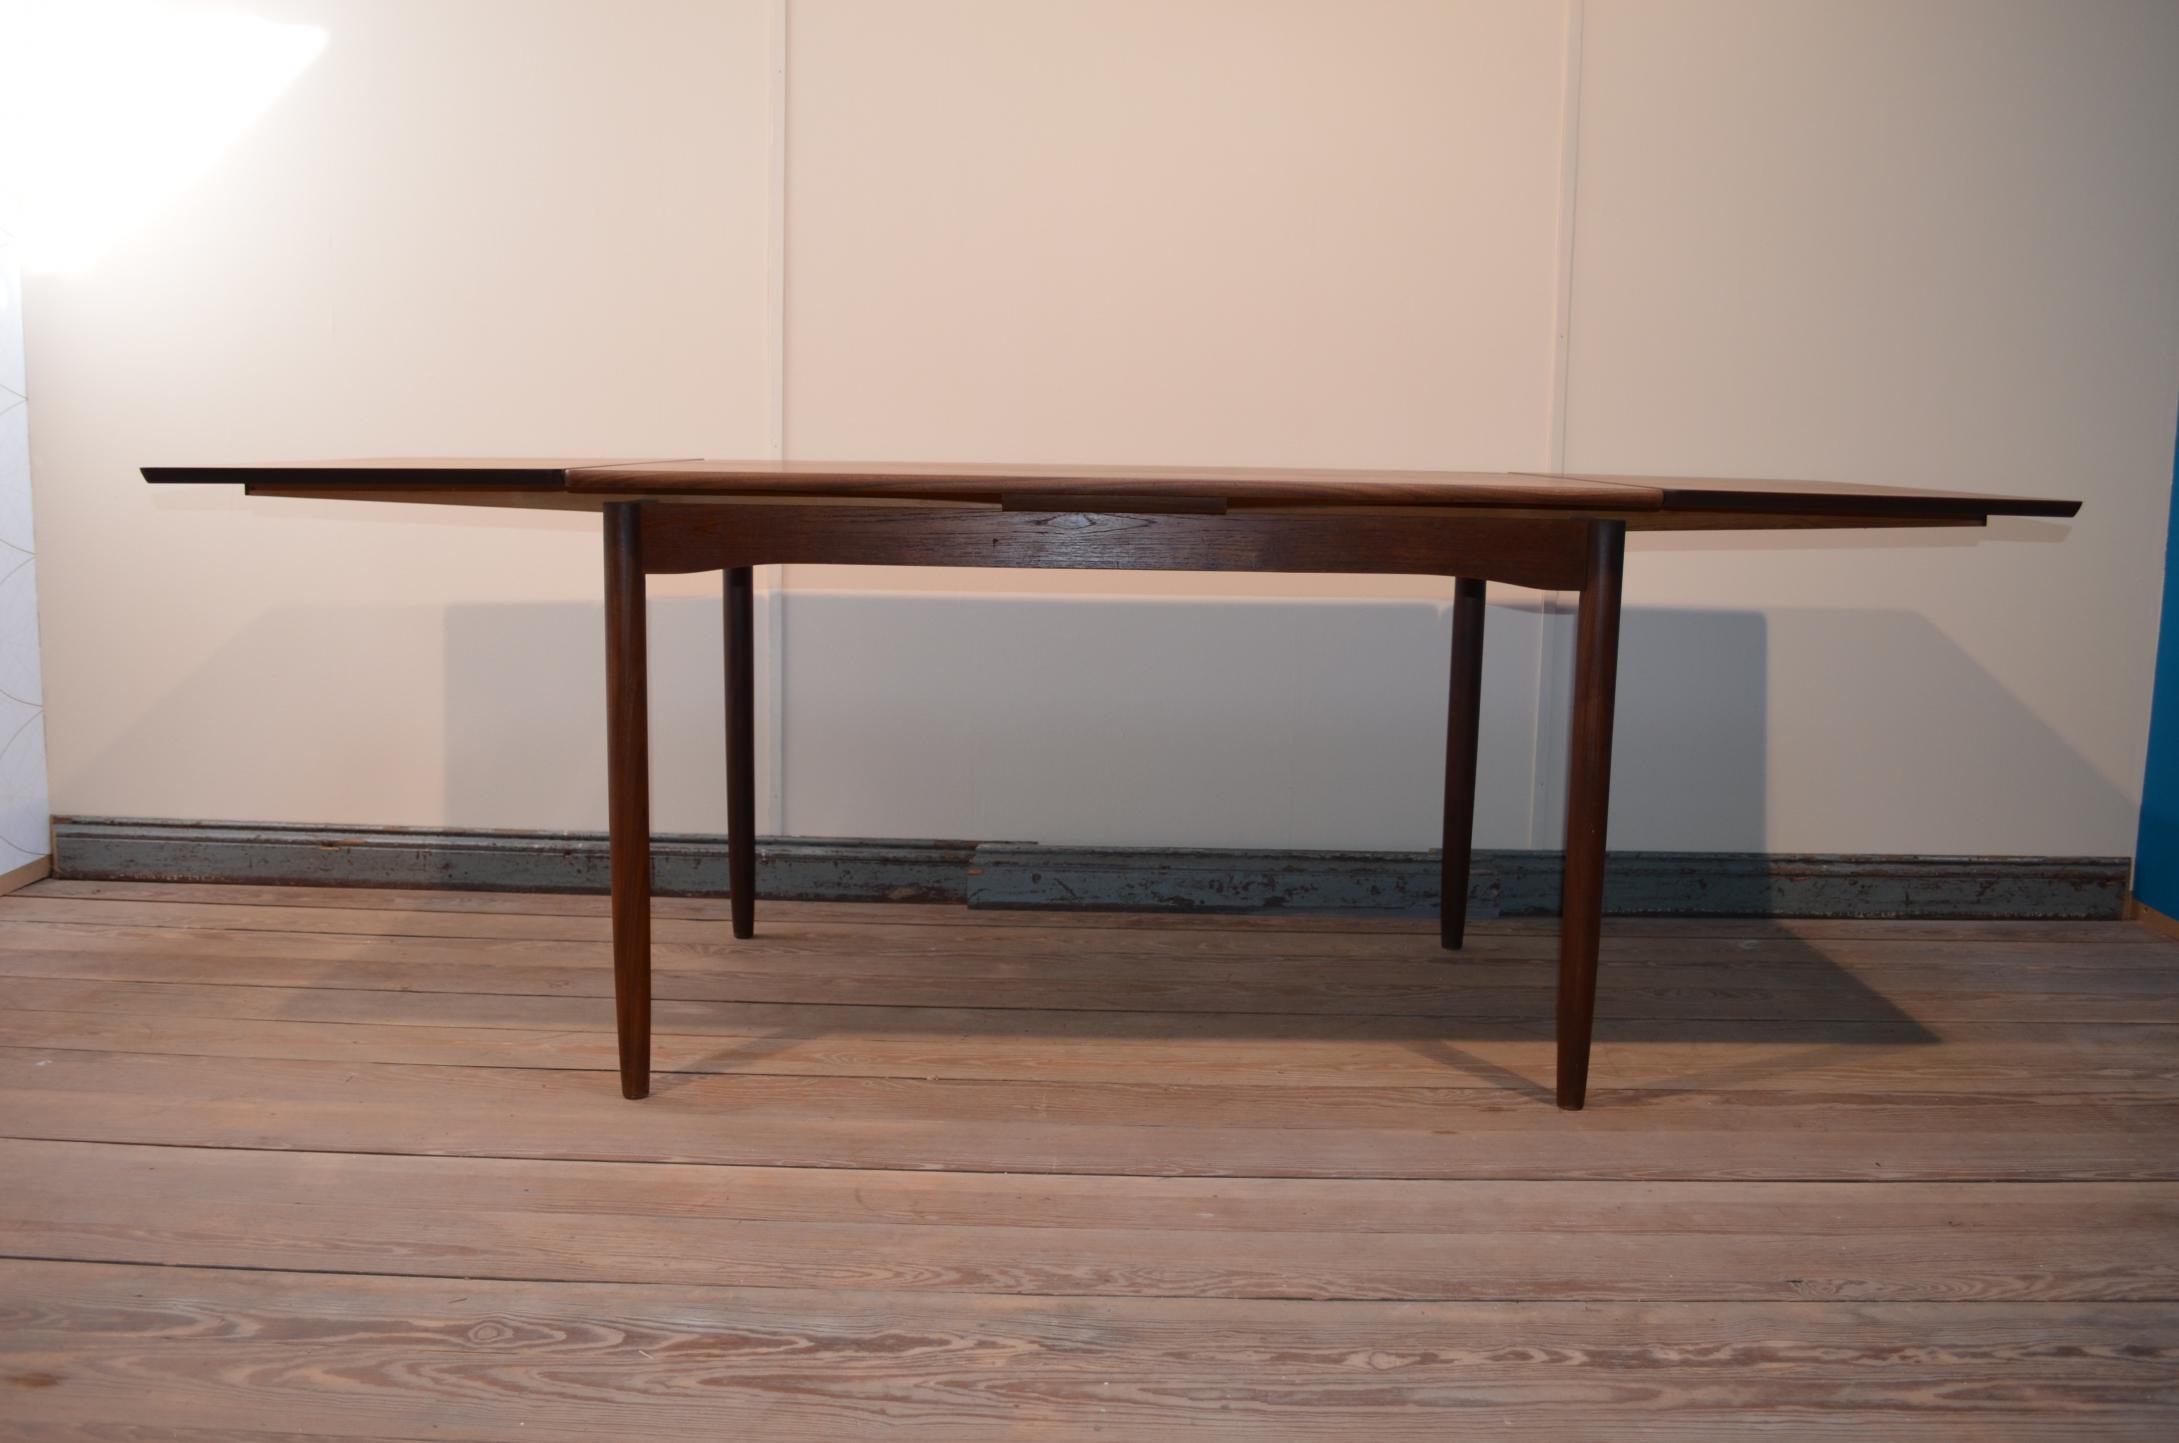 Westwerk 5 Möbel Antik Design